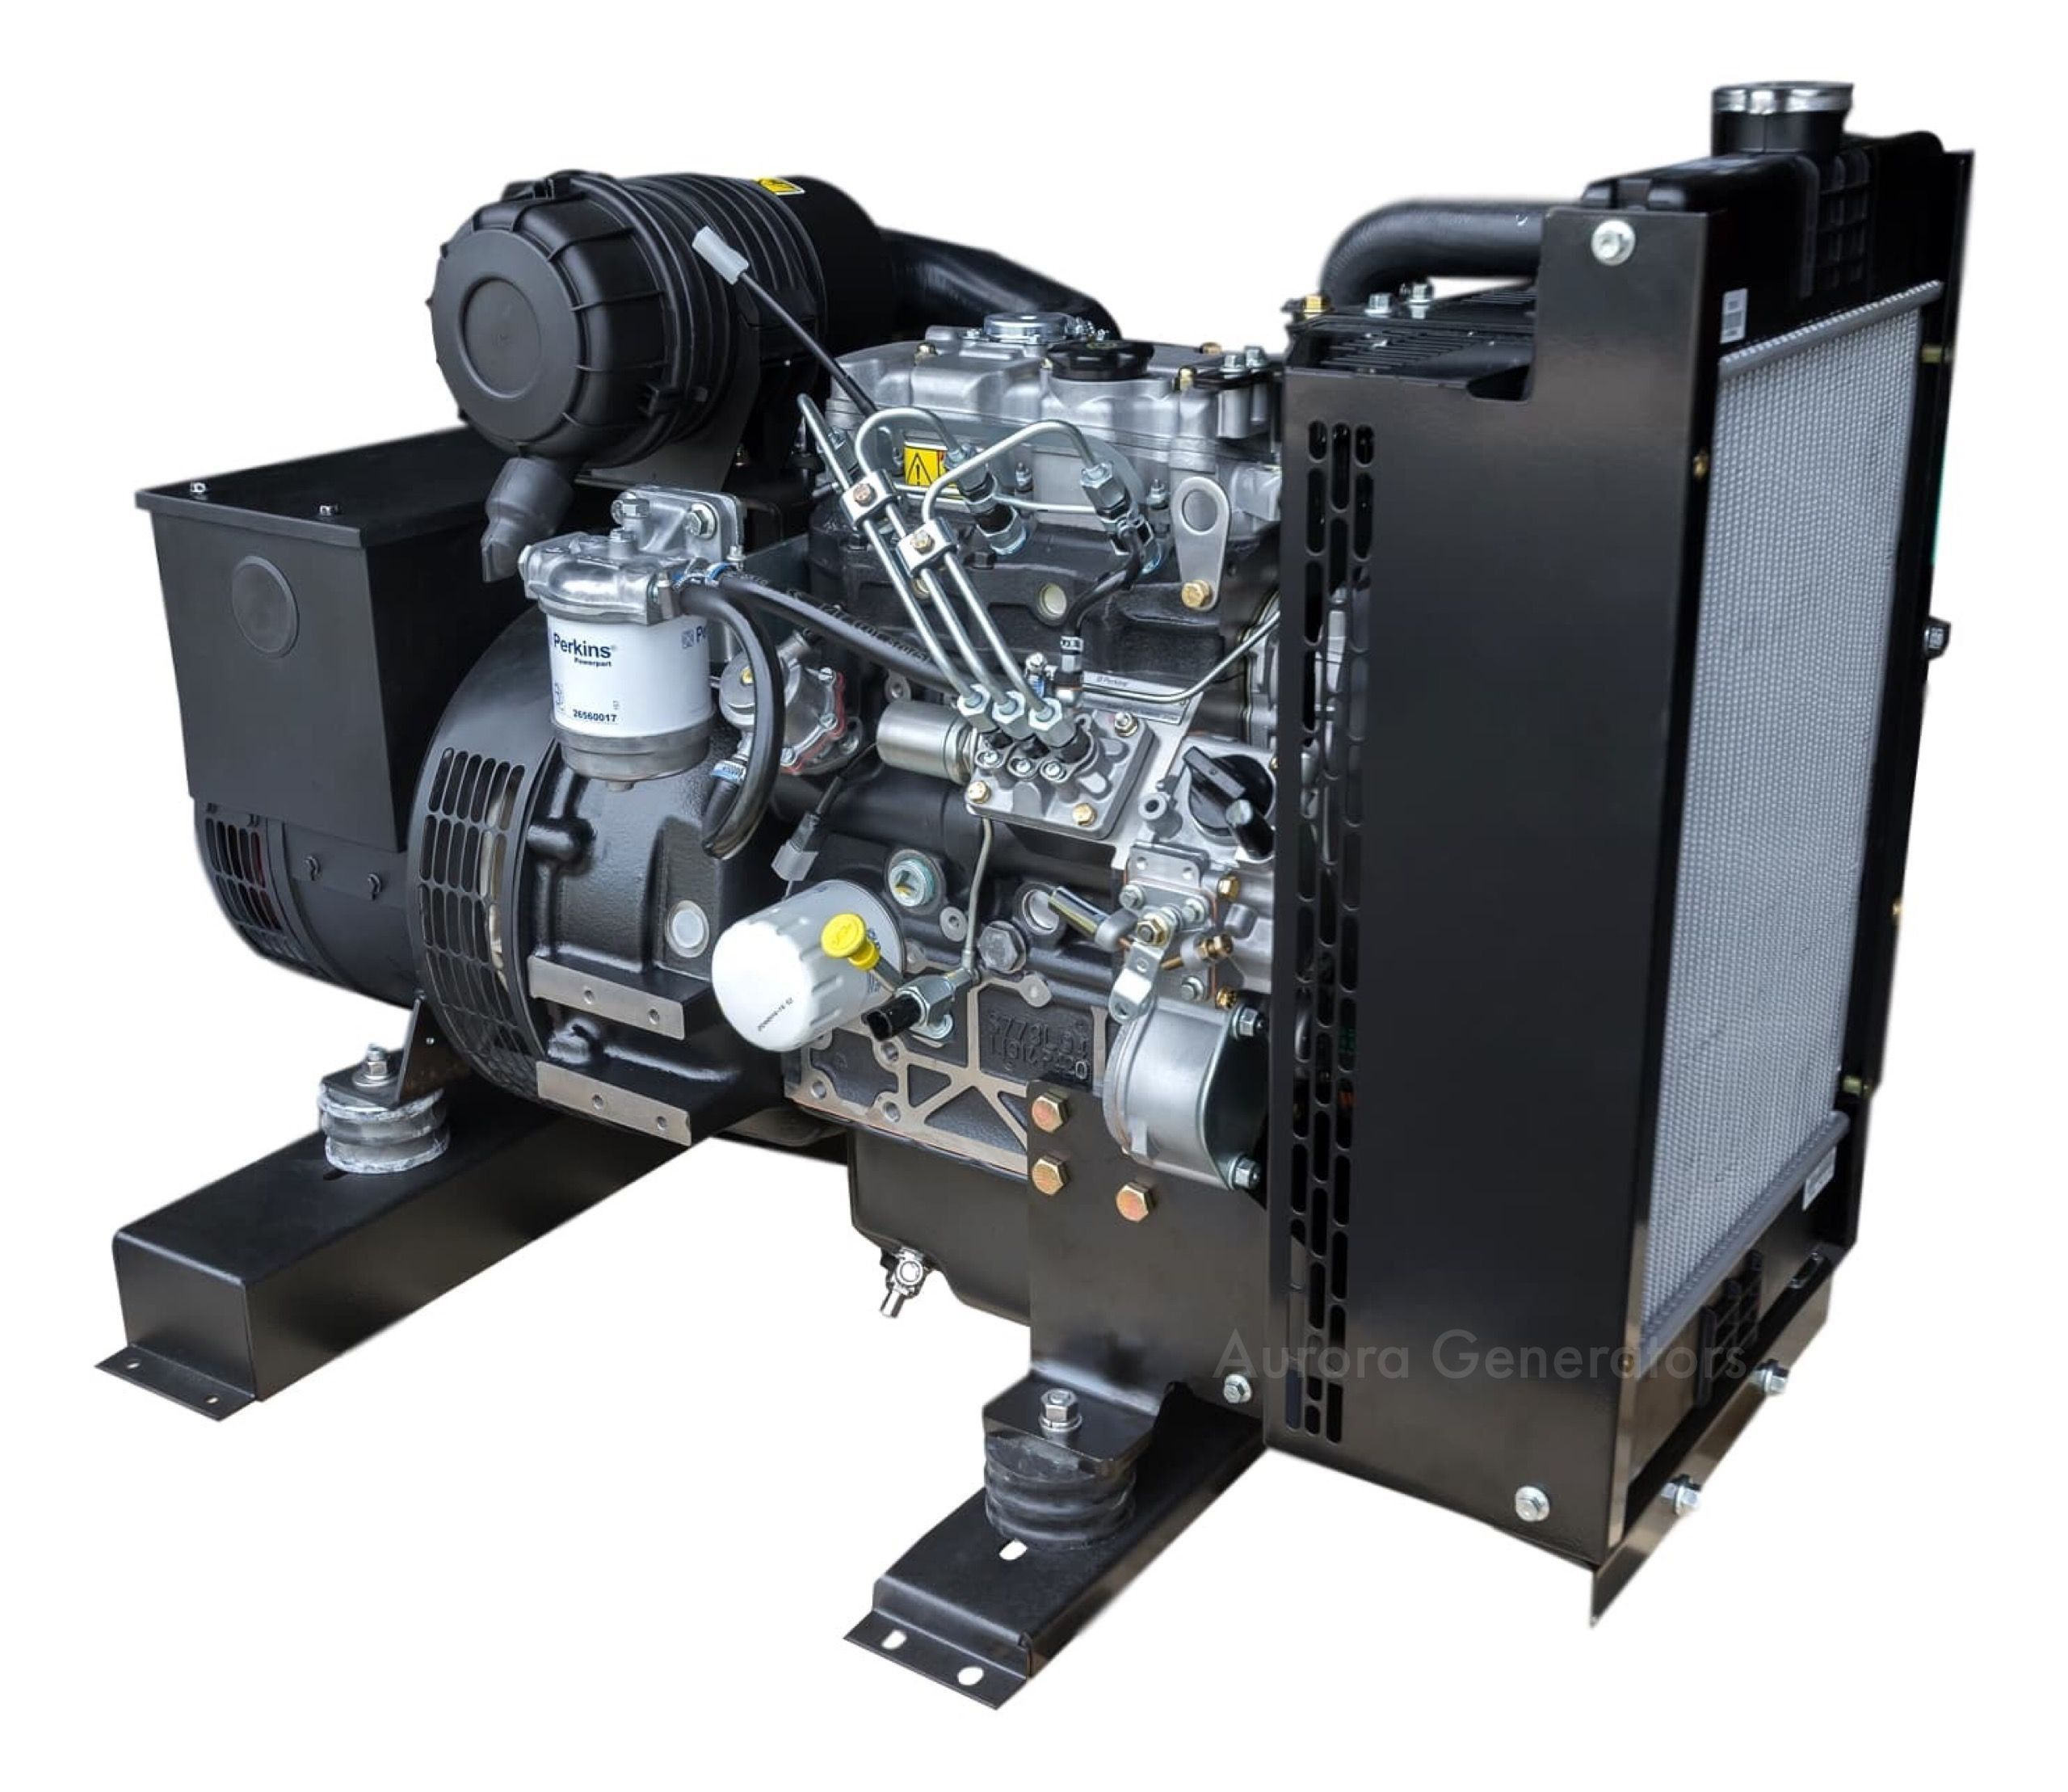 10 Kw Diesel Generator Bare Bones Aurora Generators Diesel Generators Diesel Generation